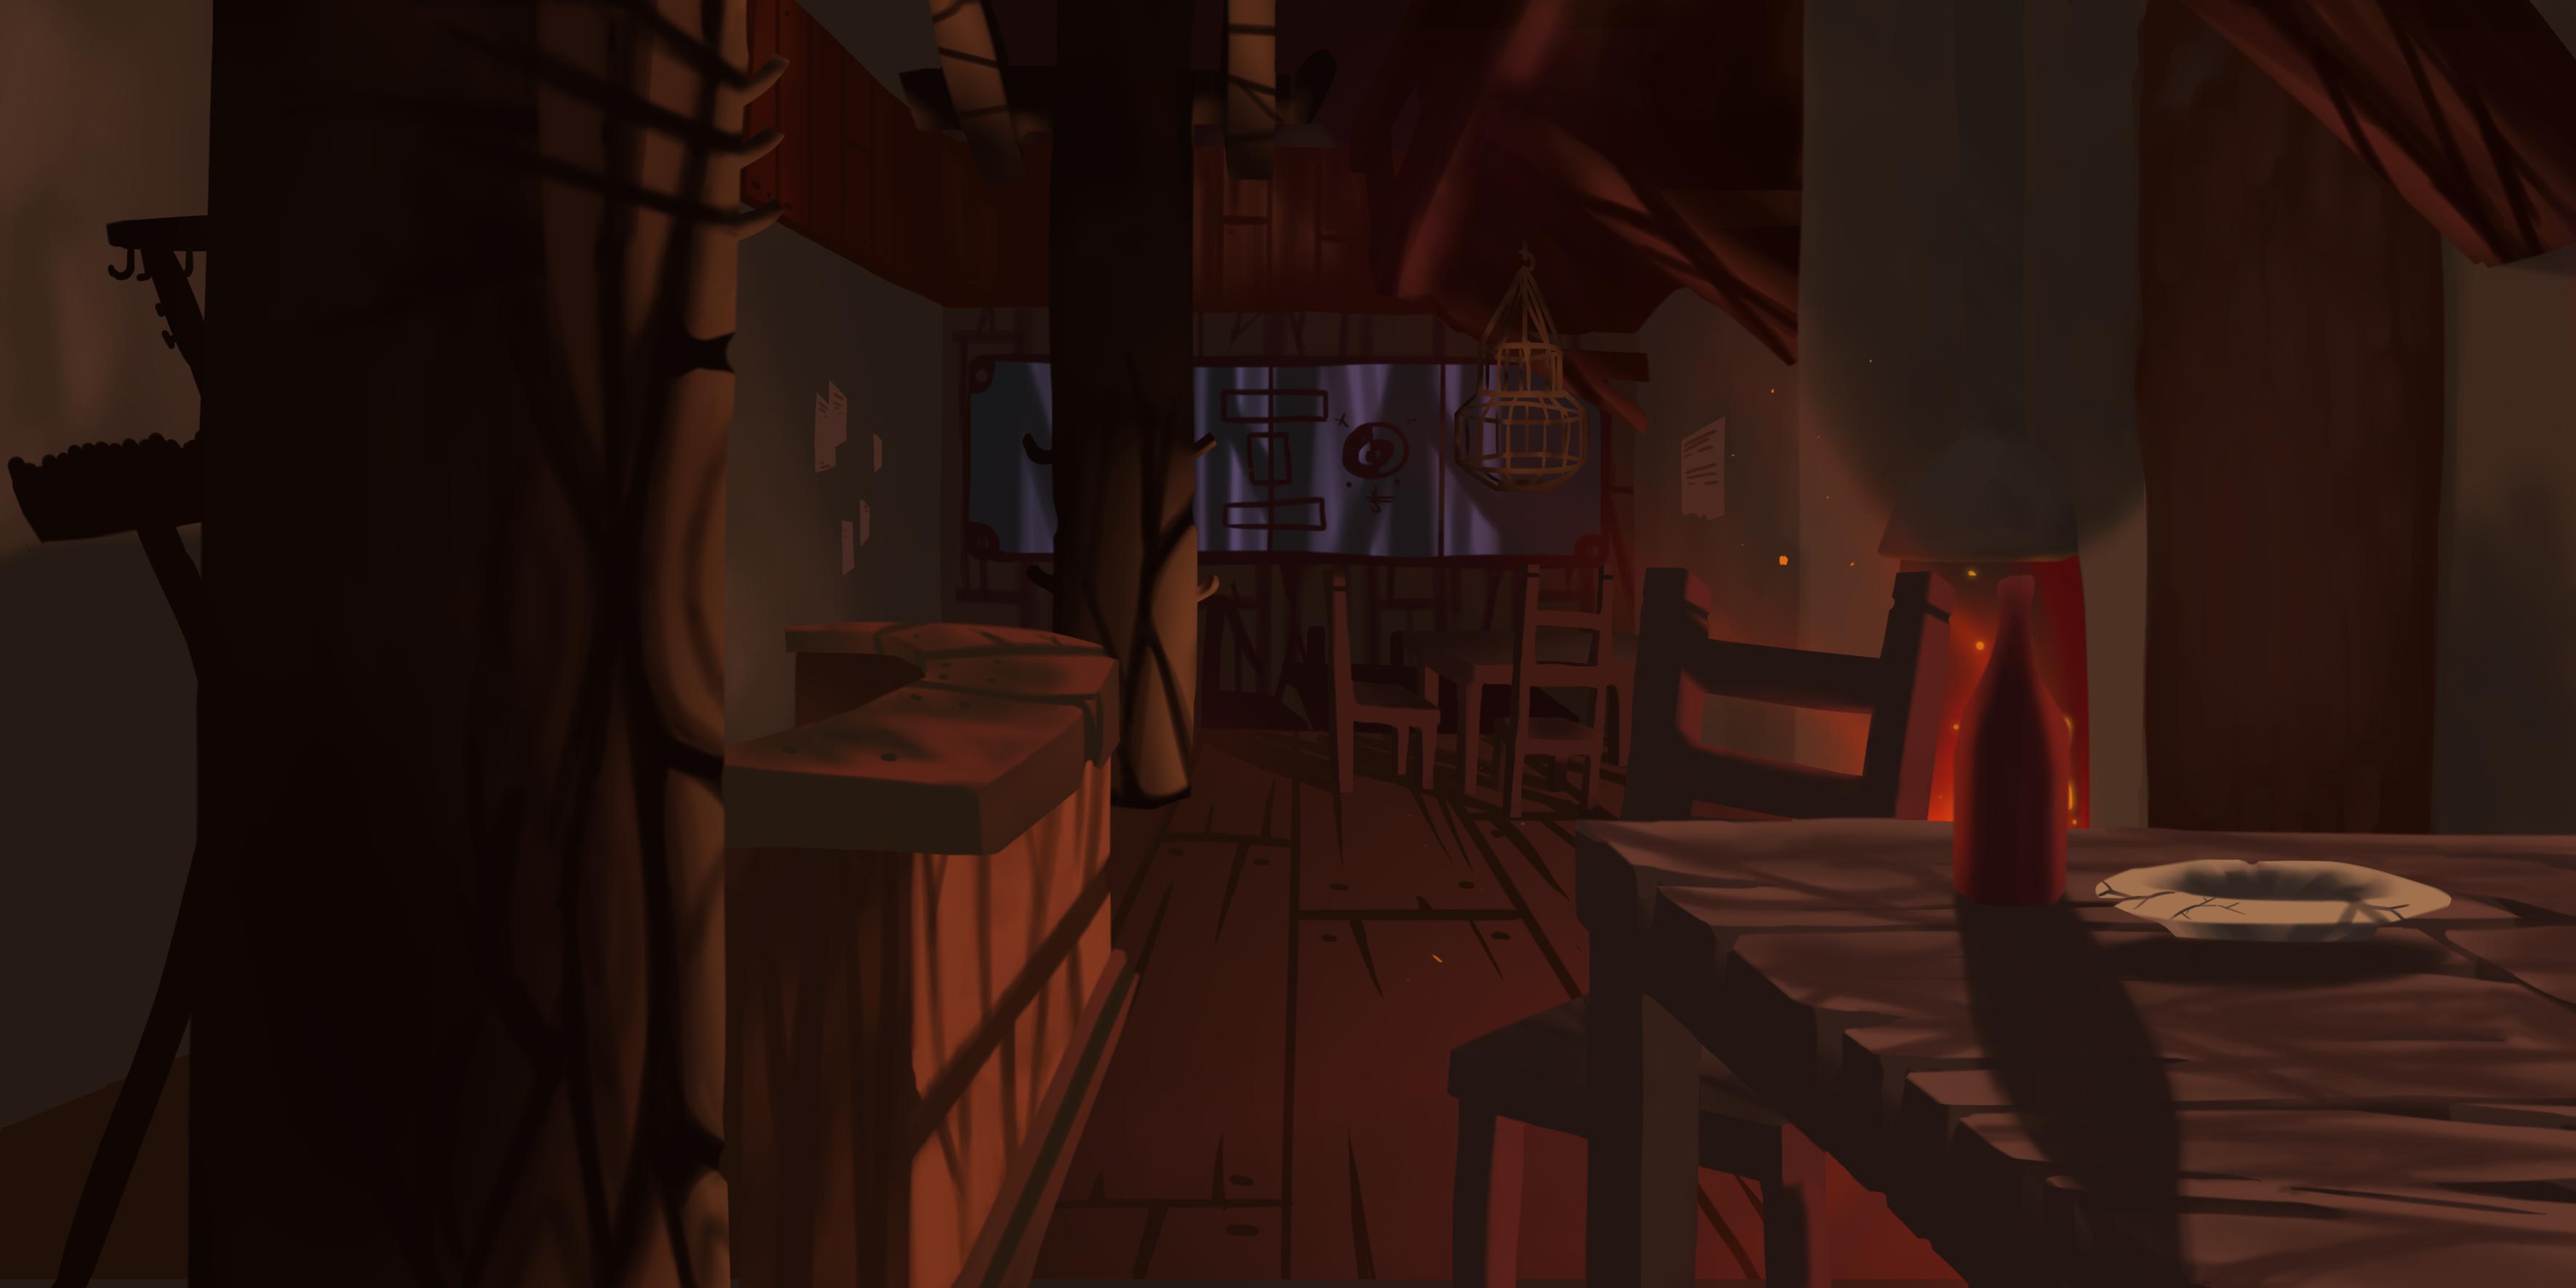 Samurai Jack's tavern